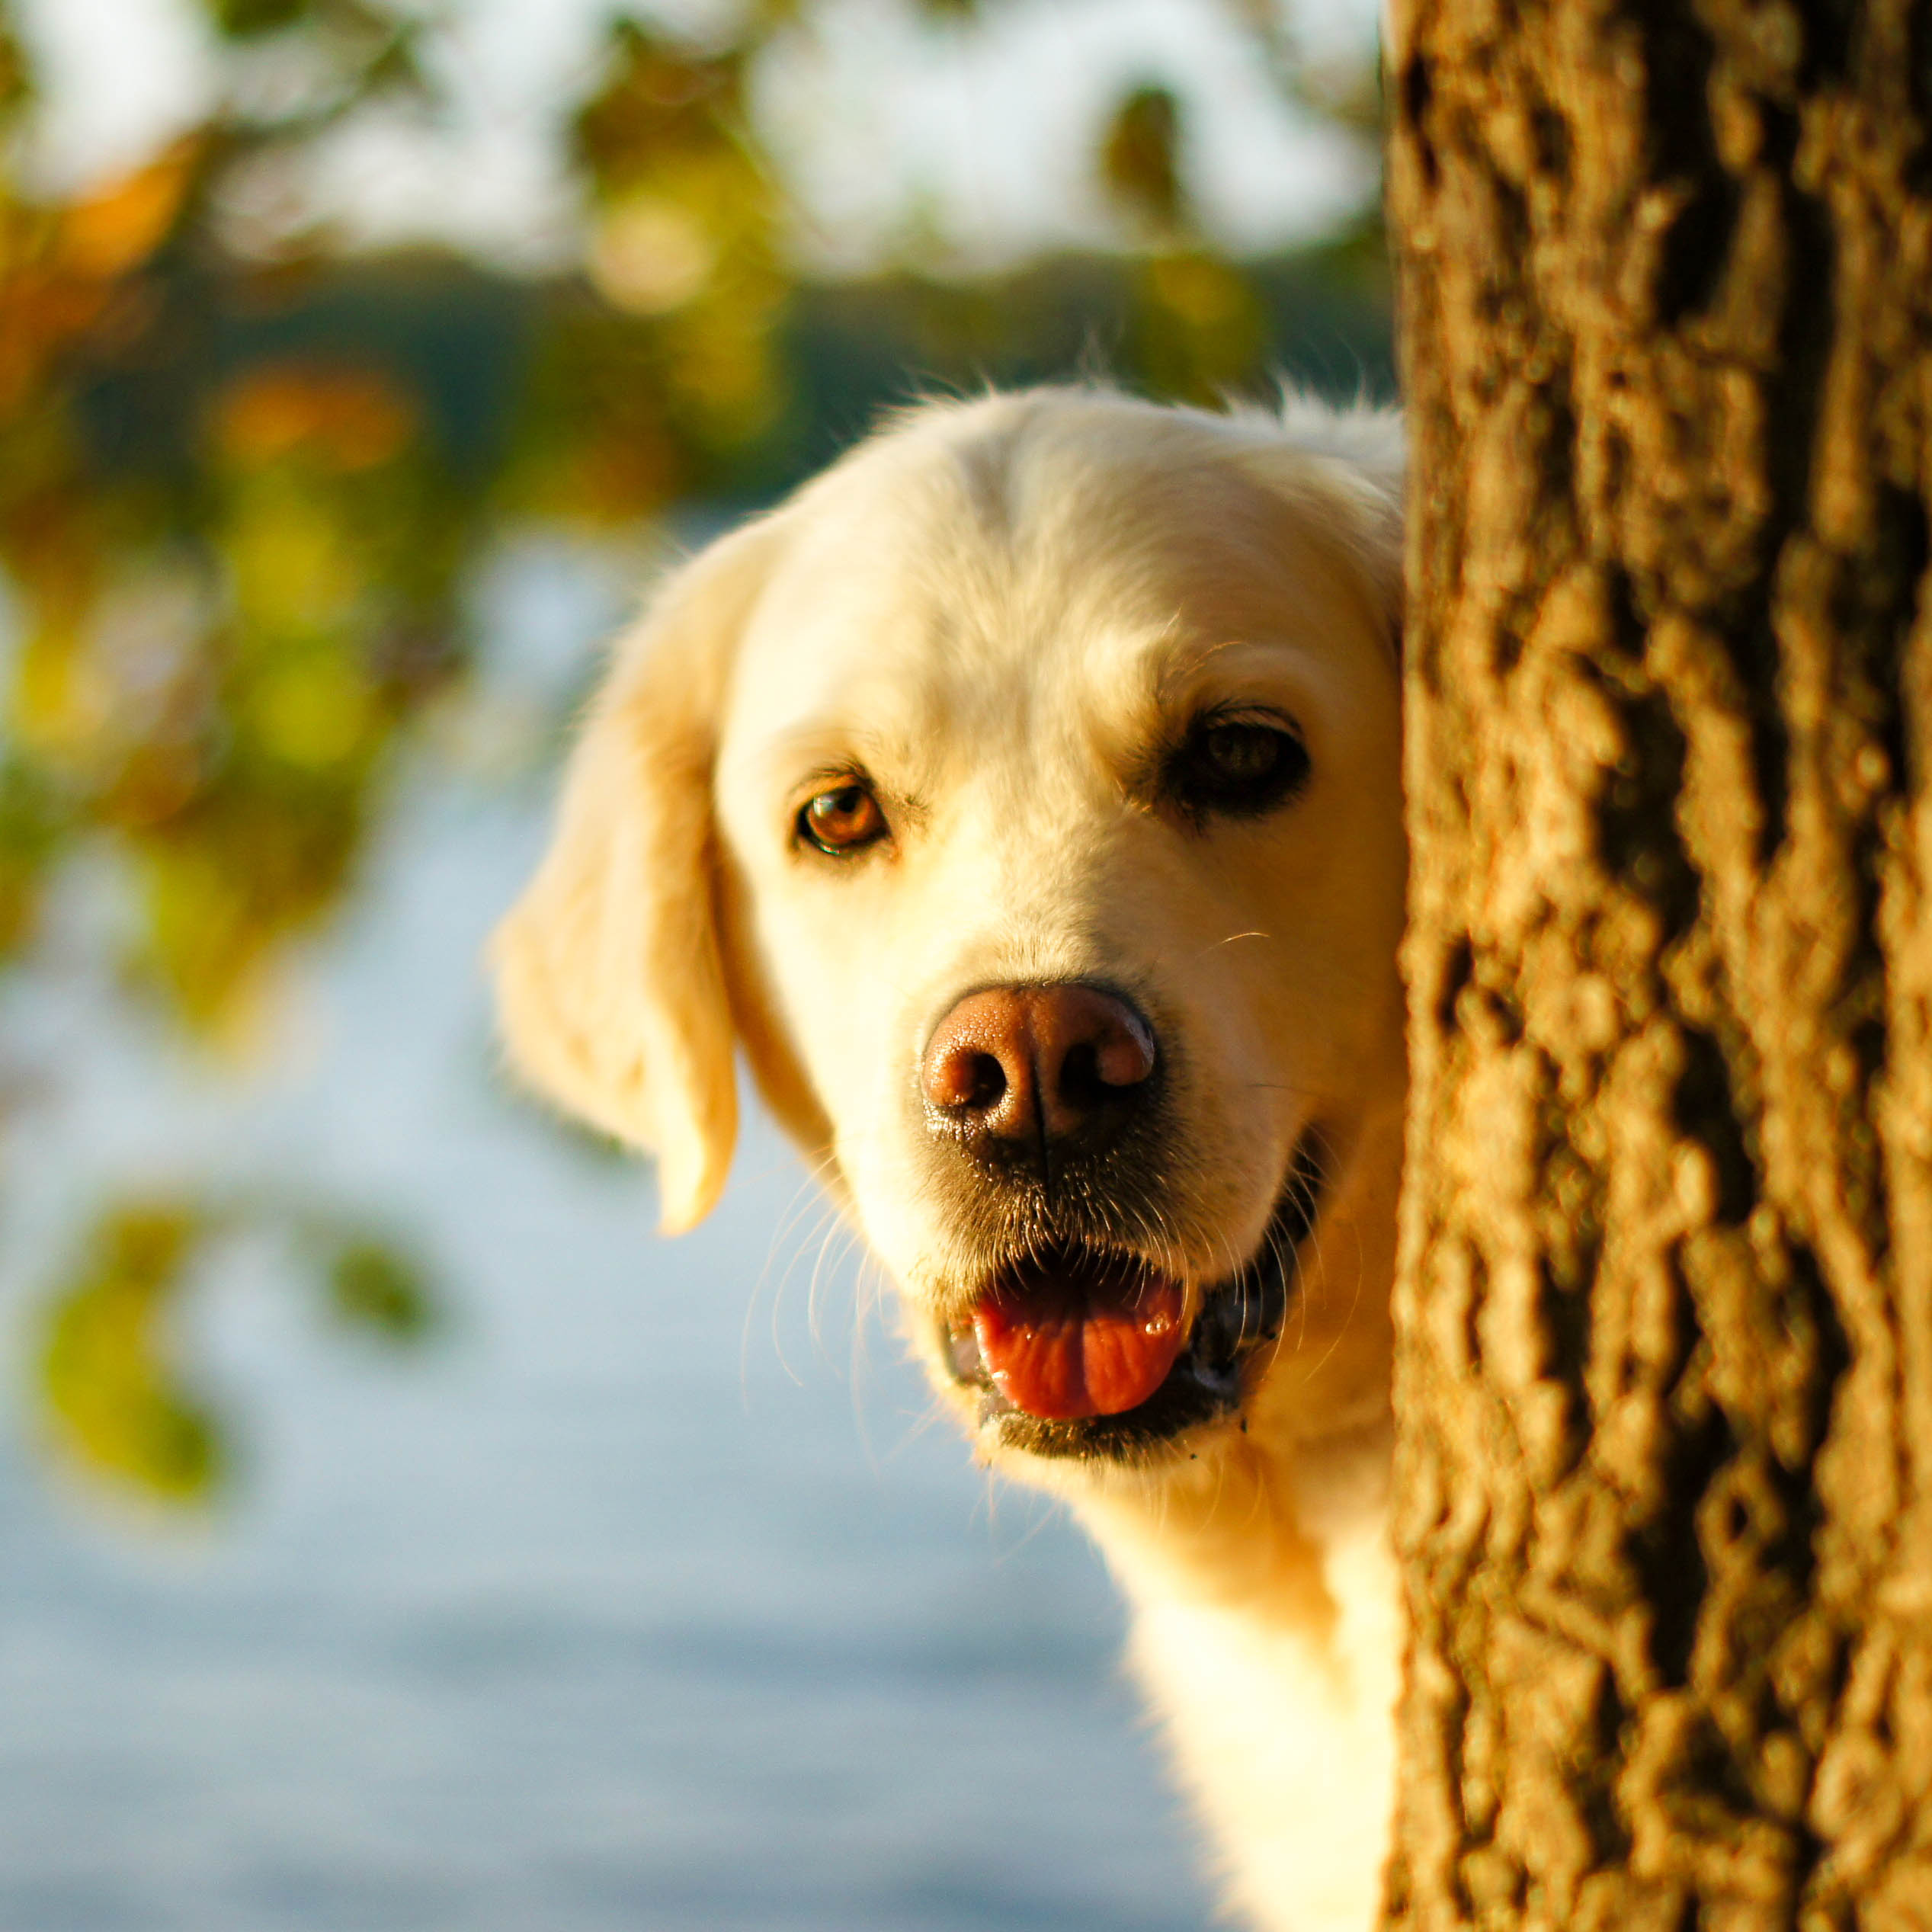 Golden Retriever schaut hinter einem Baum hervor